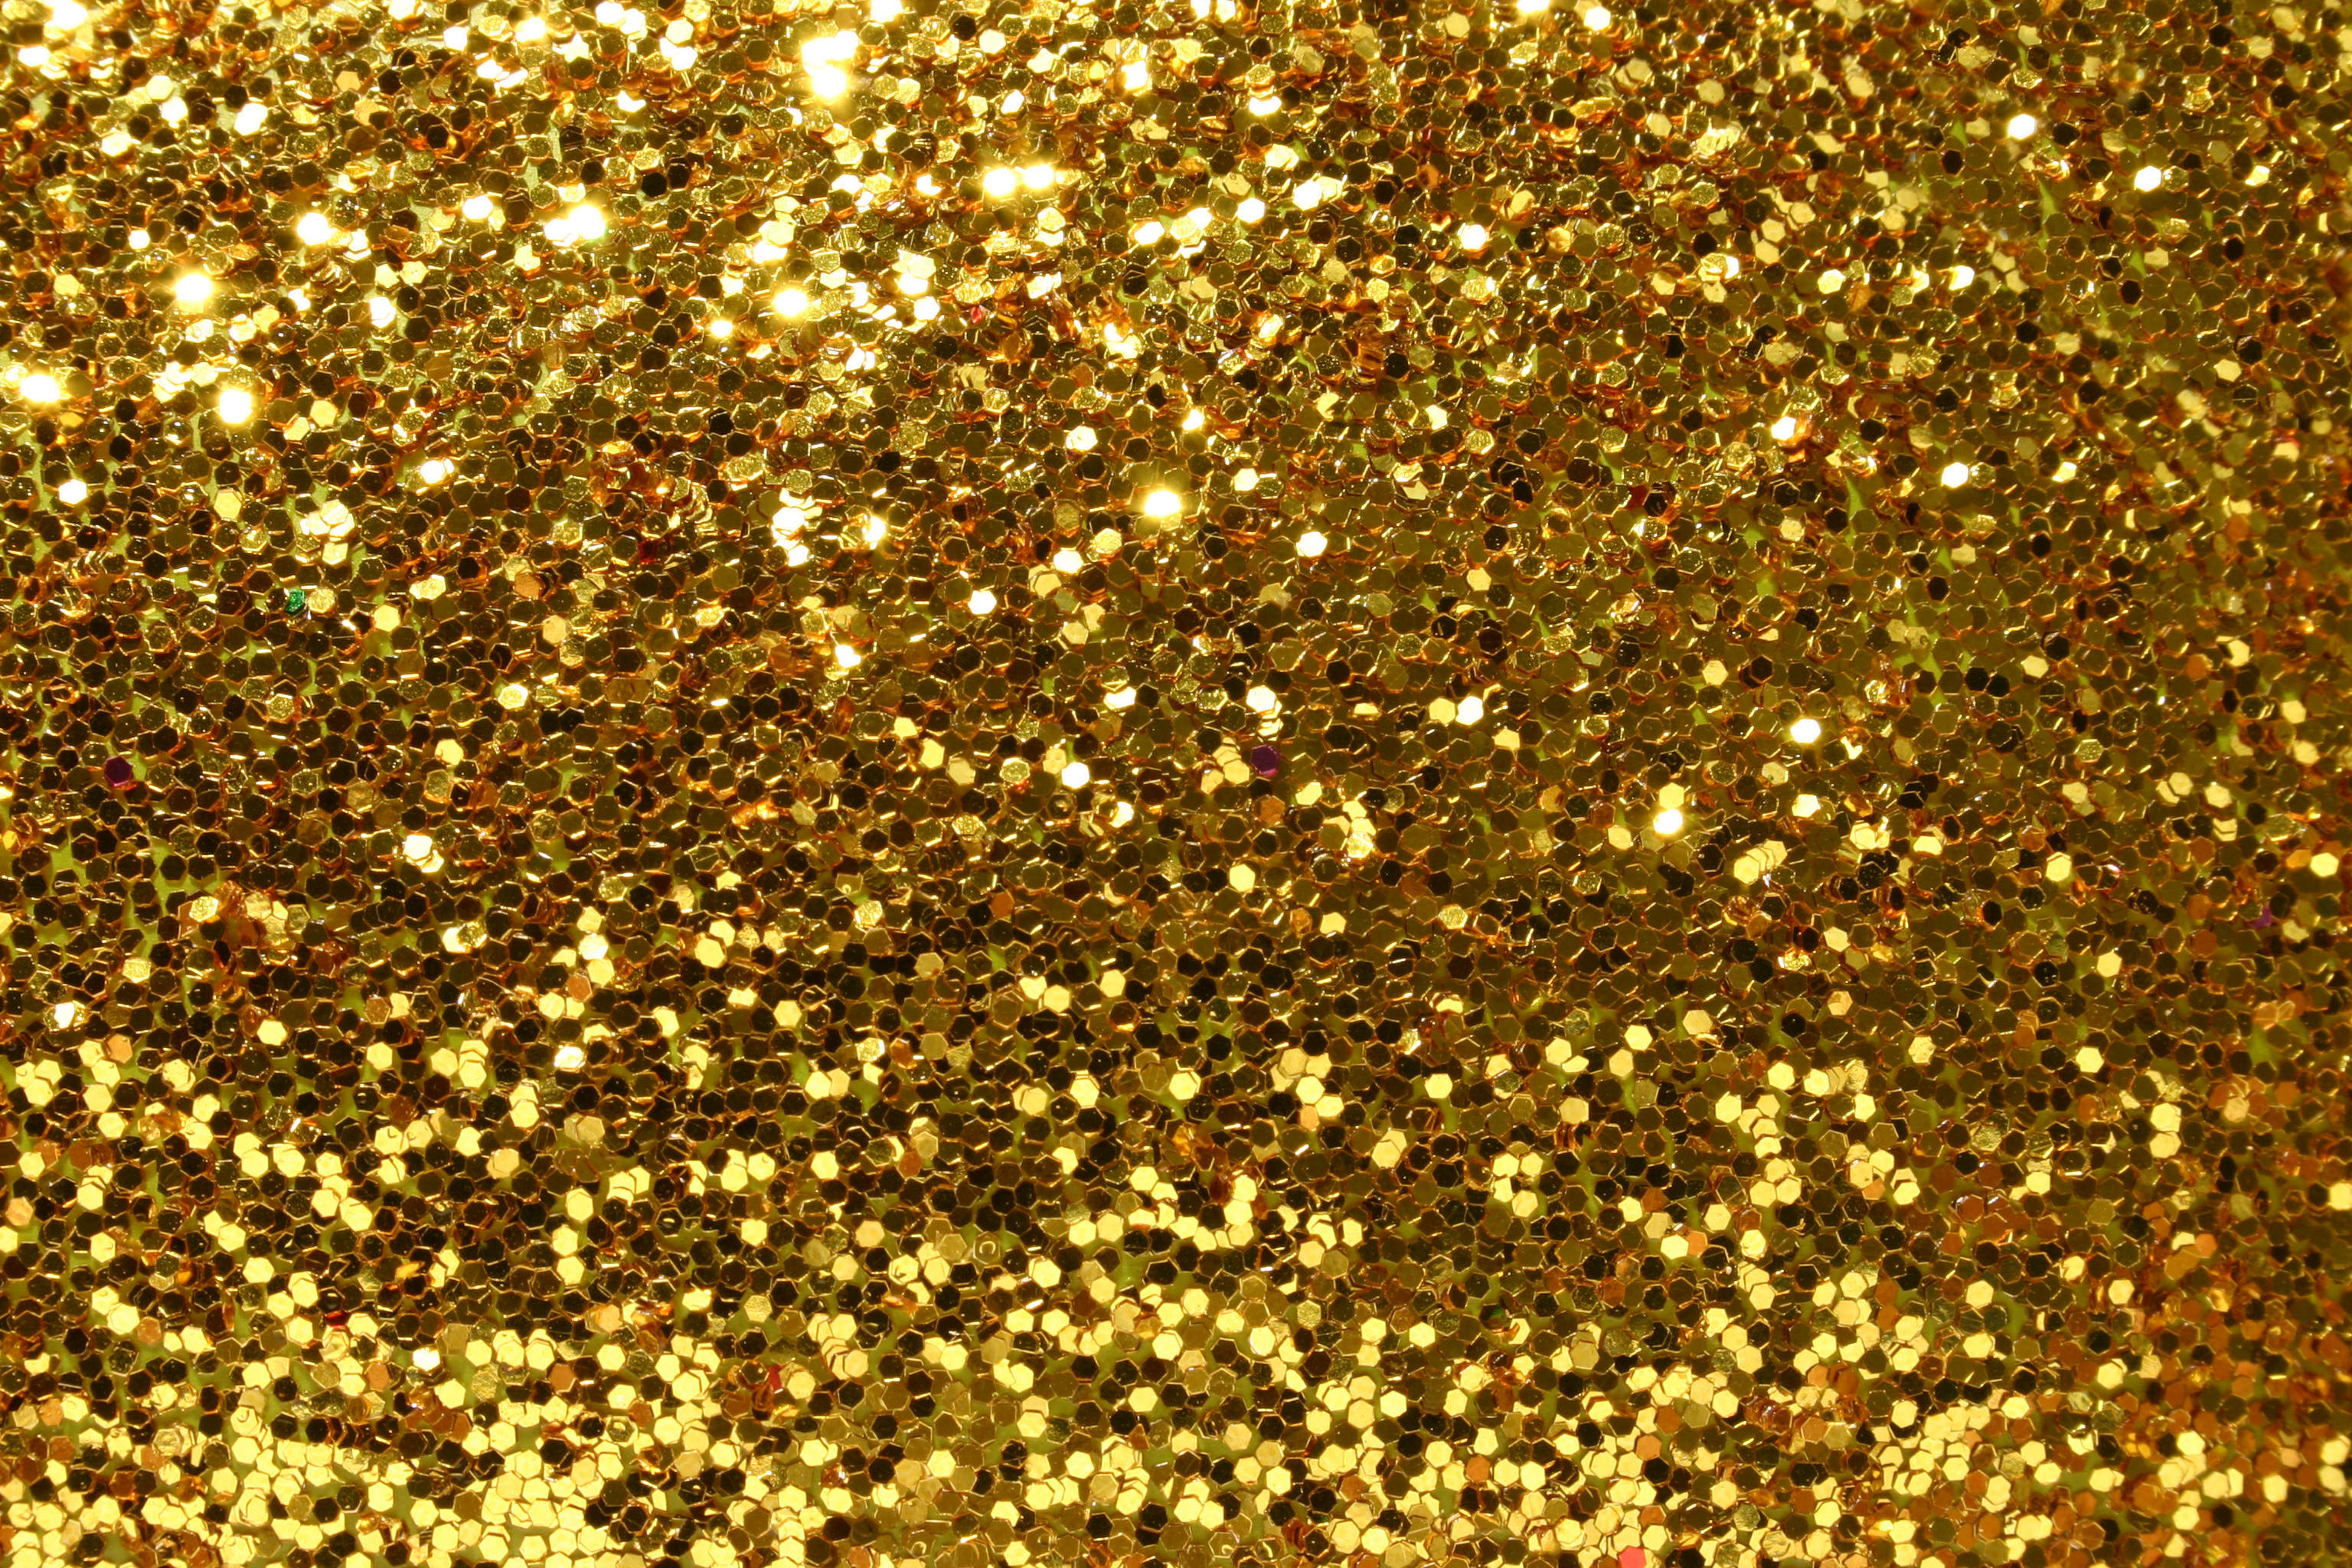 Gold Glitter Wallpapers, Best Gold Glitter Images - Stunning